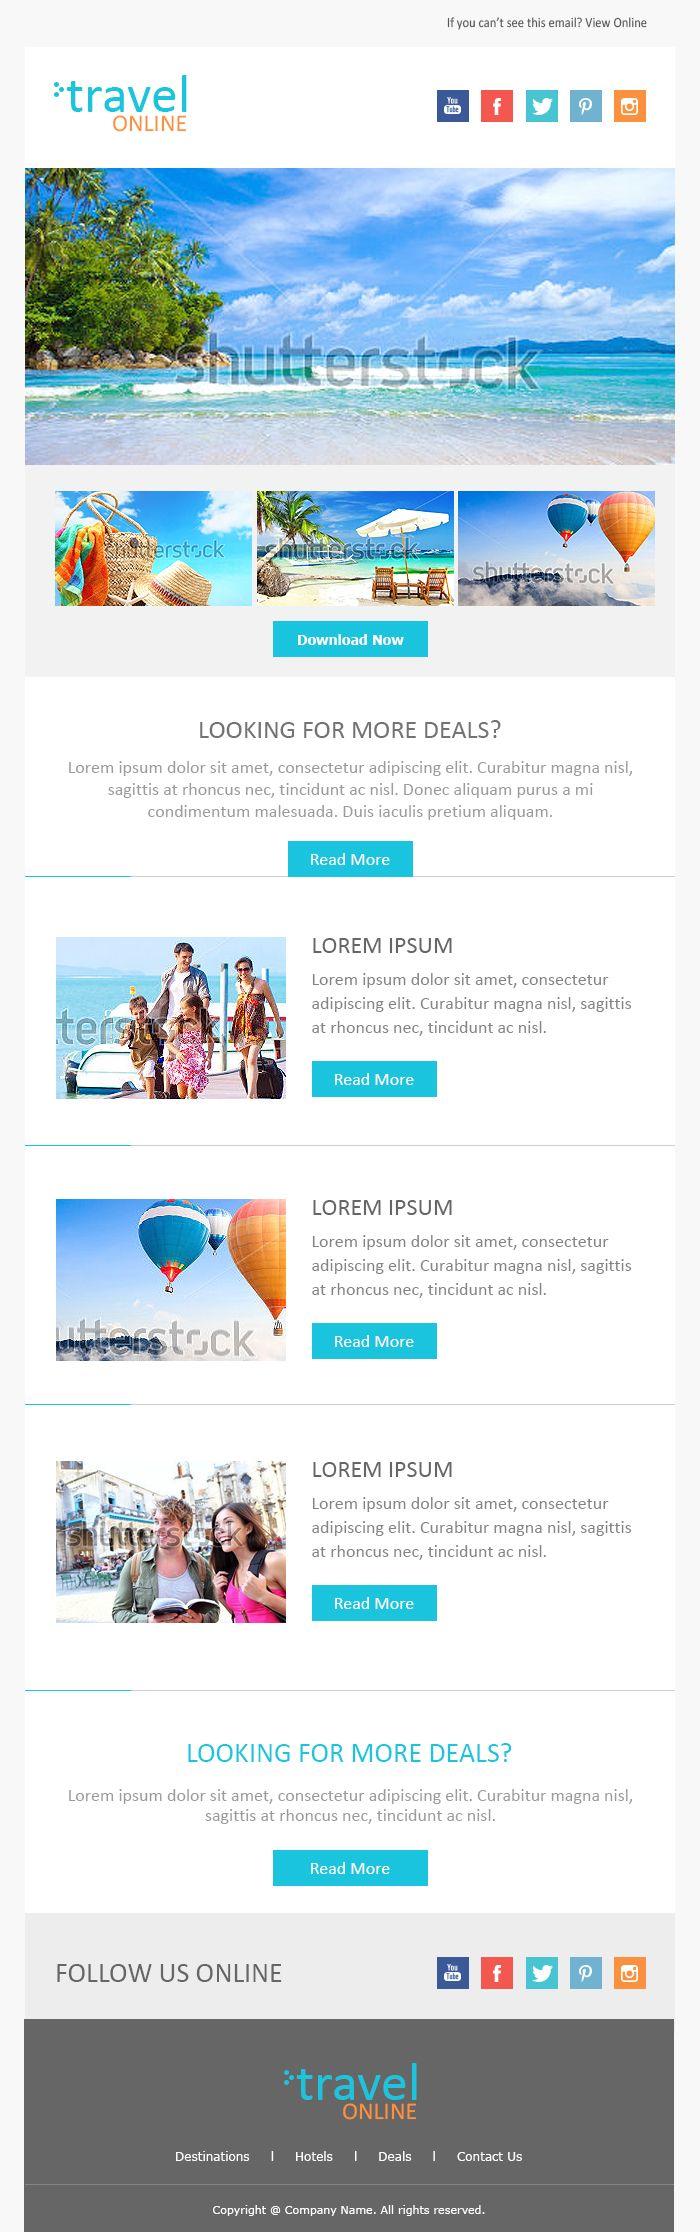 25 melhores ideias sobre Html Newsletter Templates no Pinterest – Sample Html Email